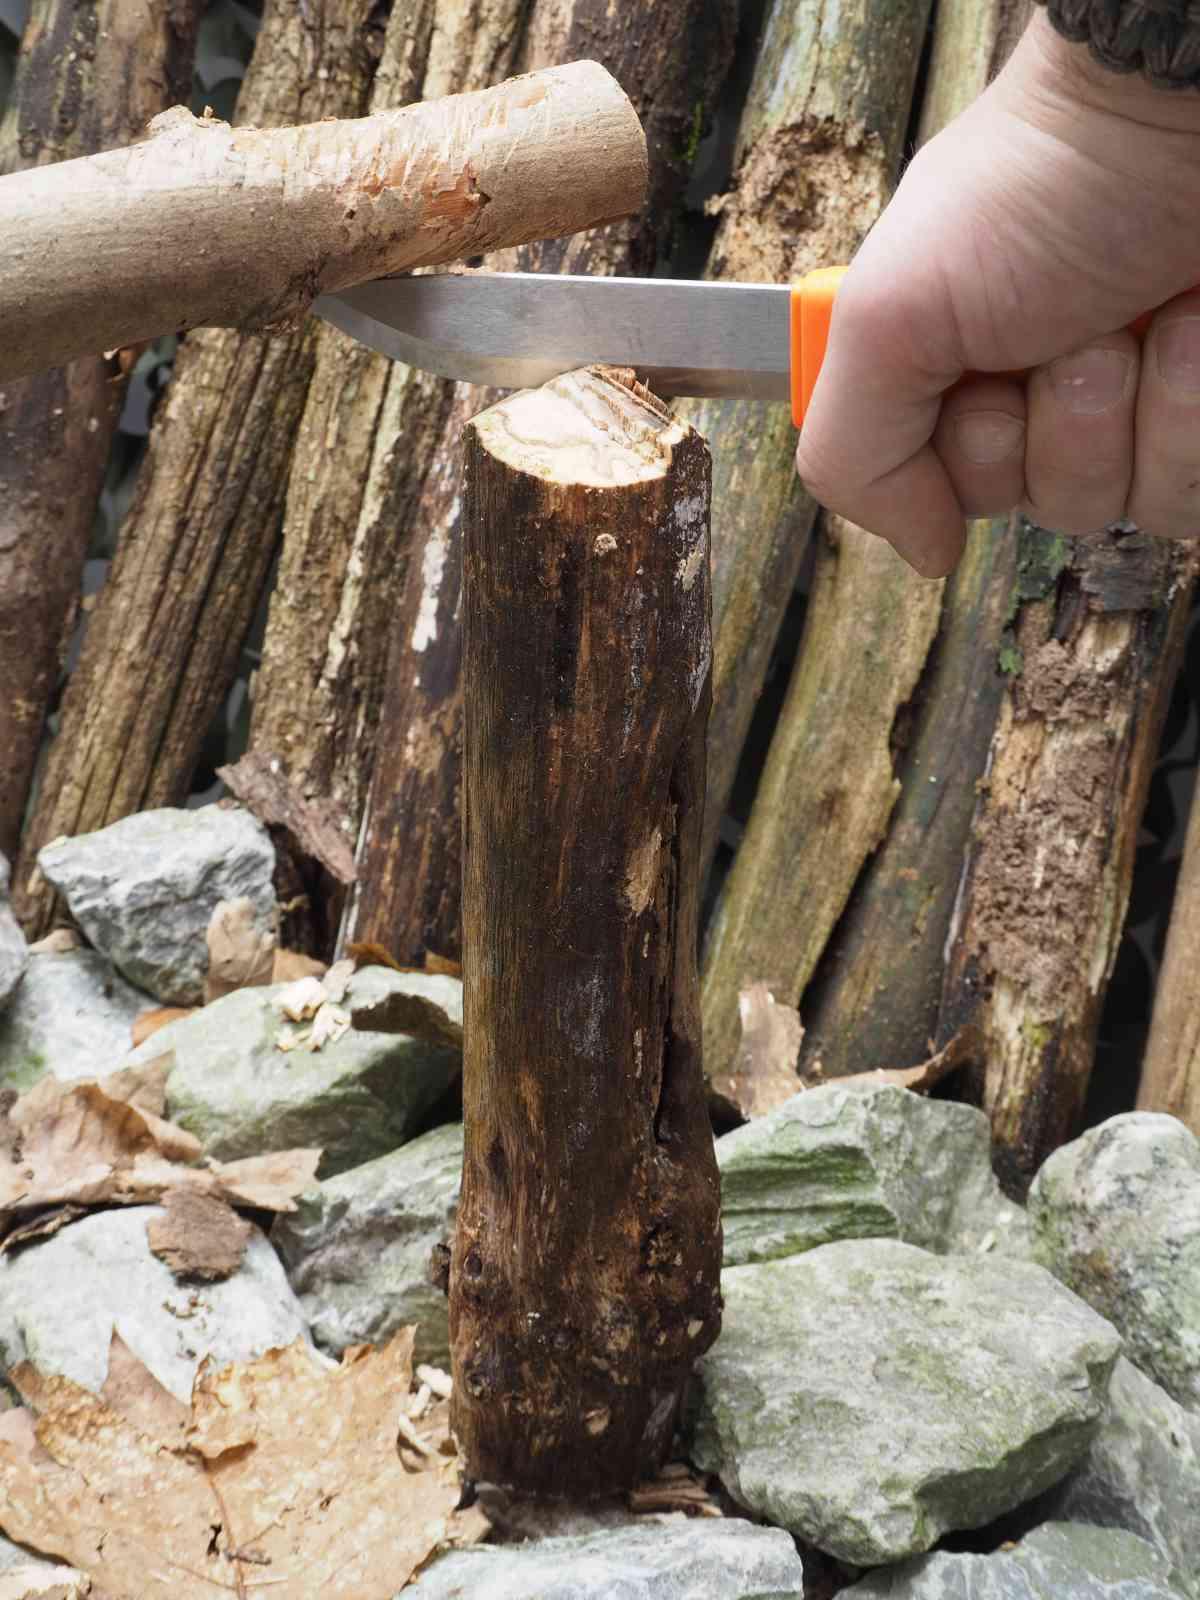 Mora Bushcraft Survival - Holzarbeiten 02